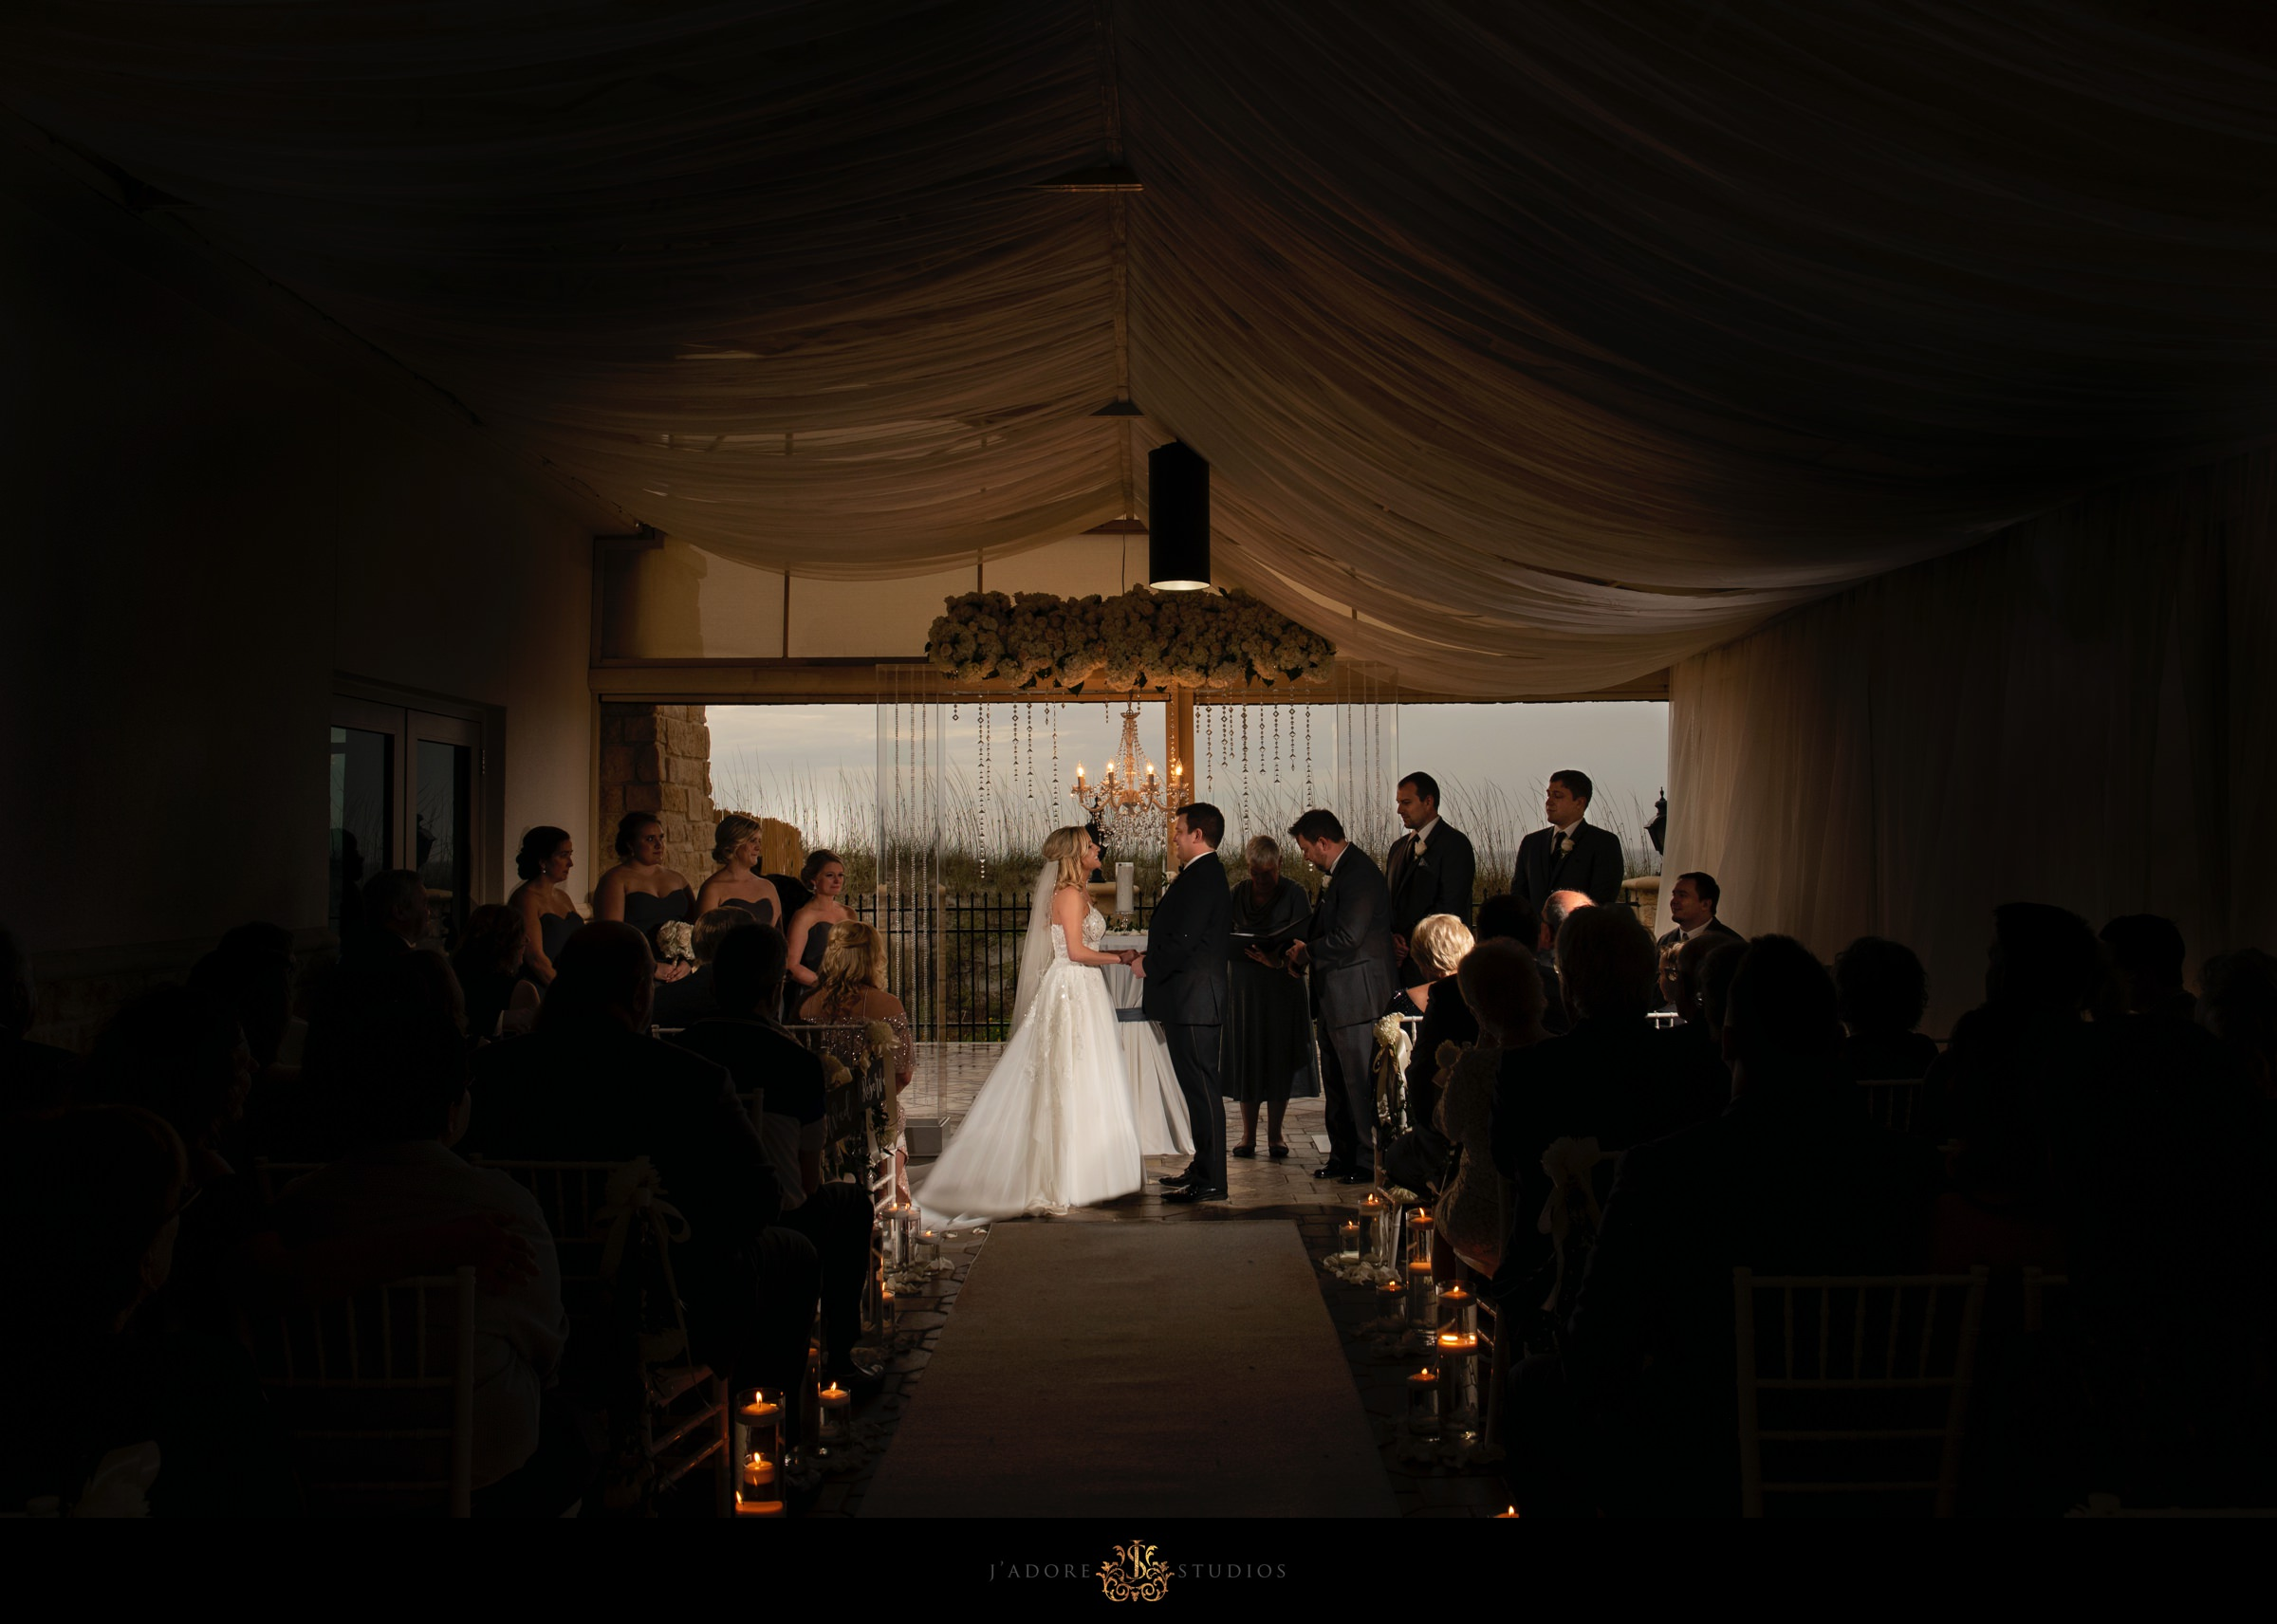 Verandina sunset ceremony at One Ocean Resort & Spa Jacksonville Wedding Venue